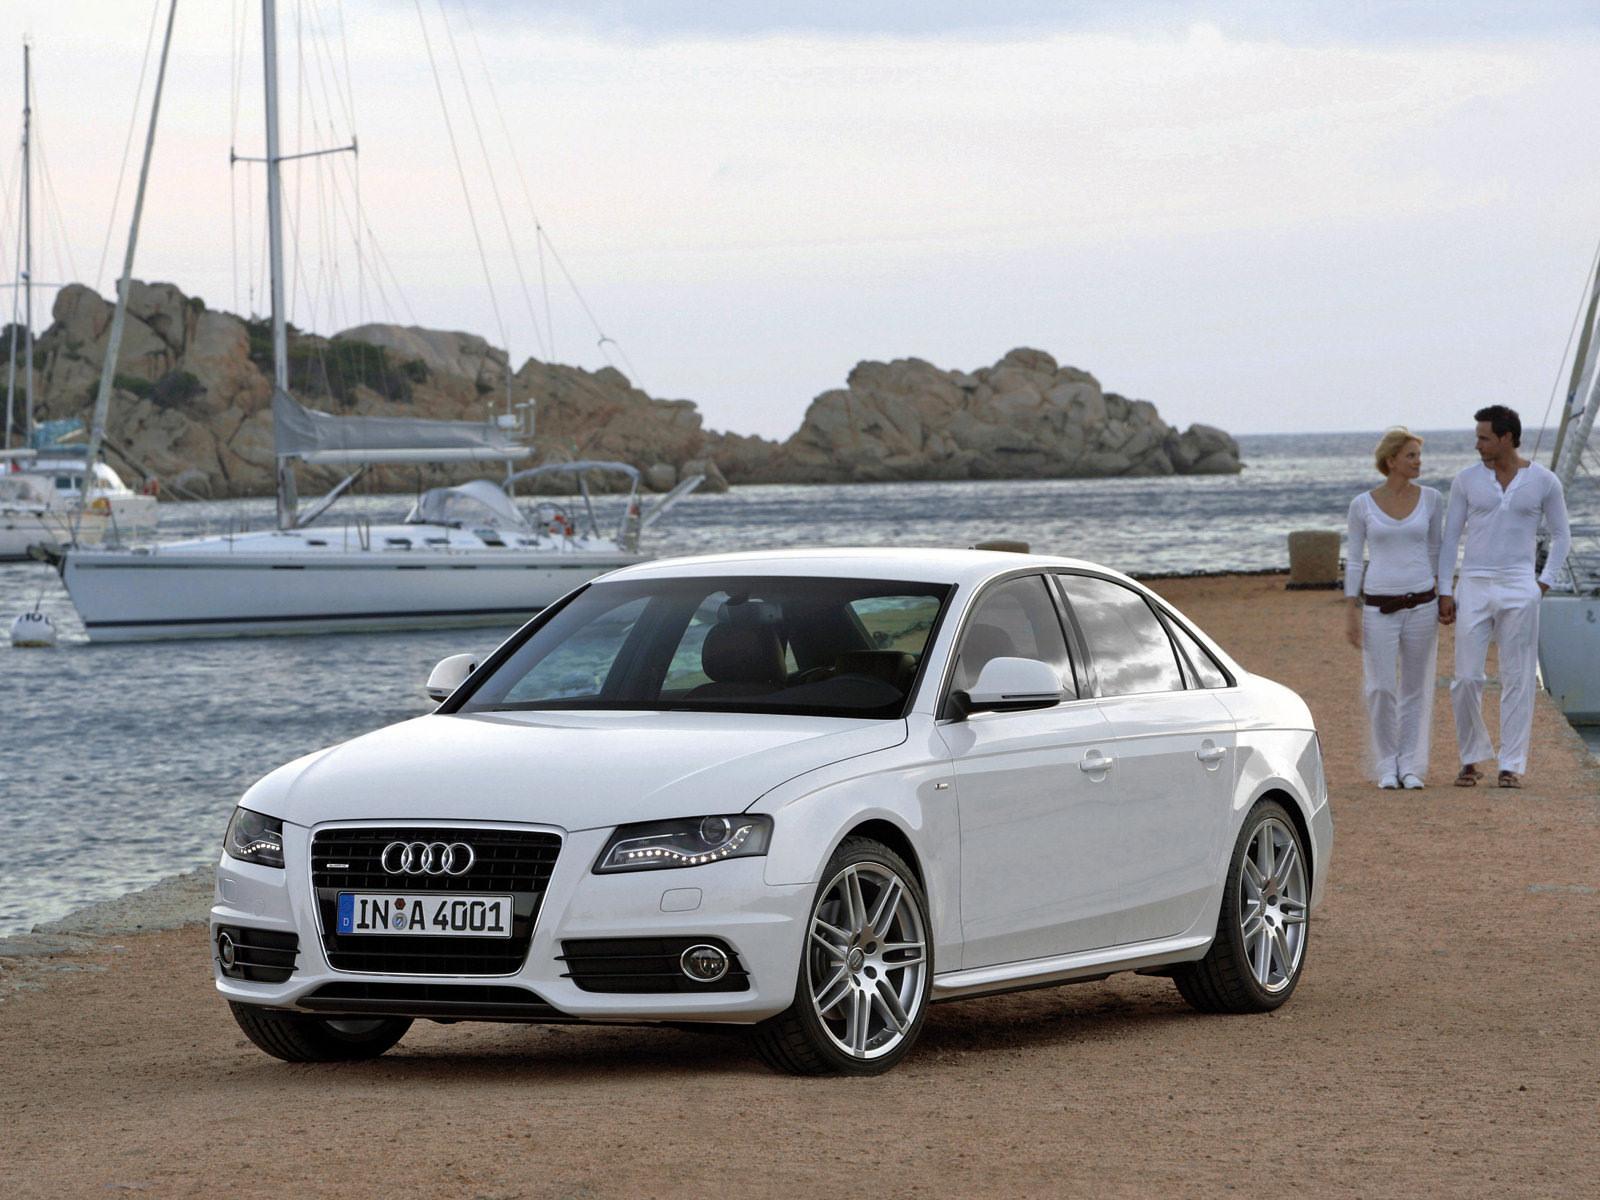 2008 Audi A4 Image 13